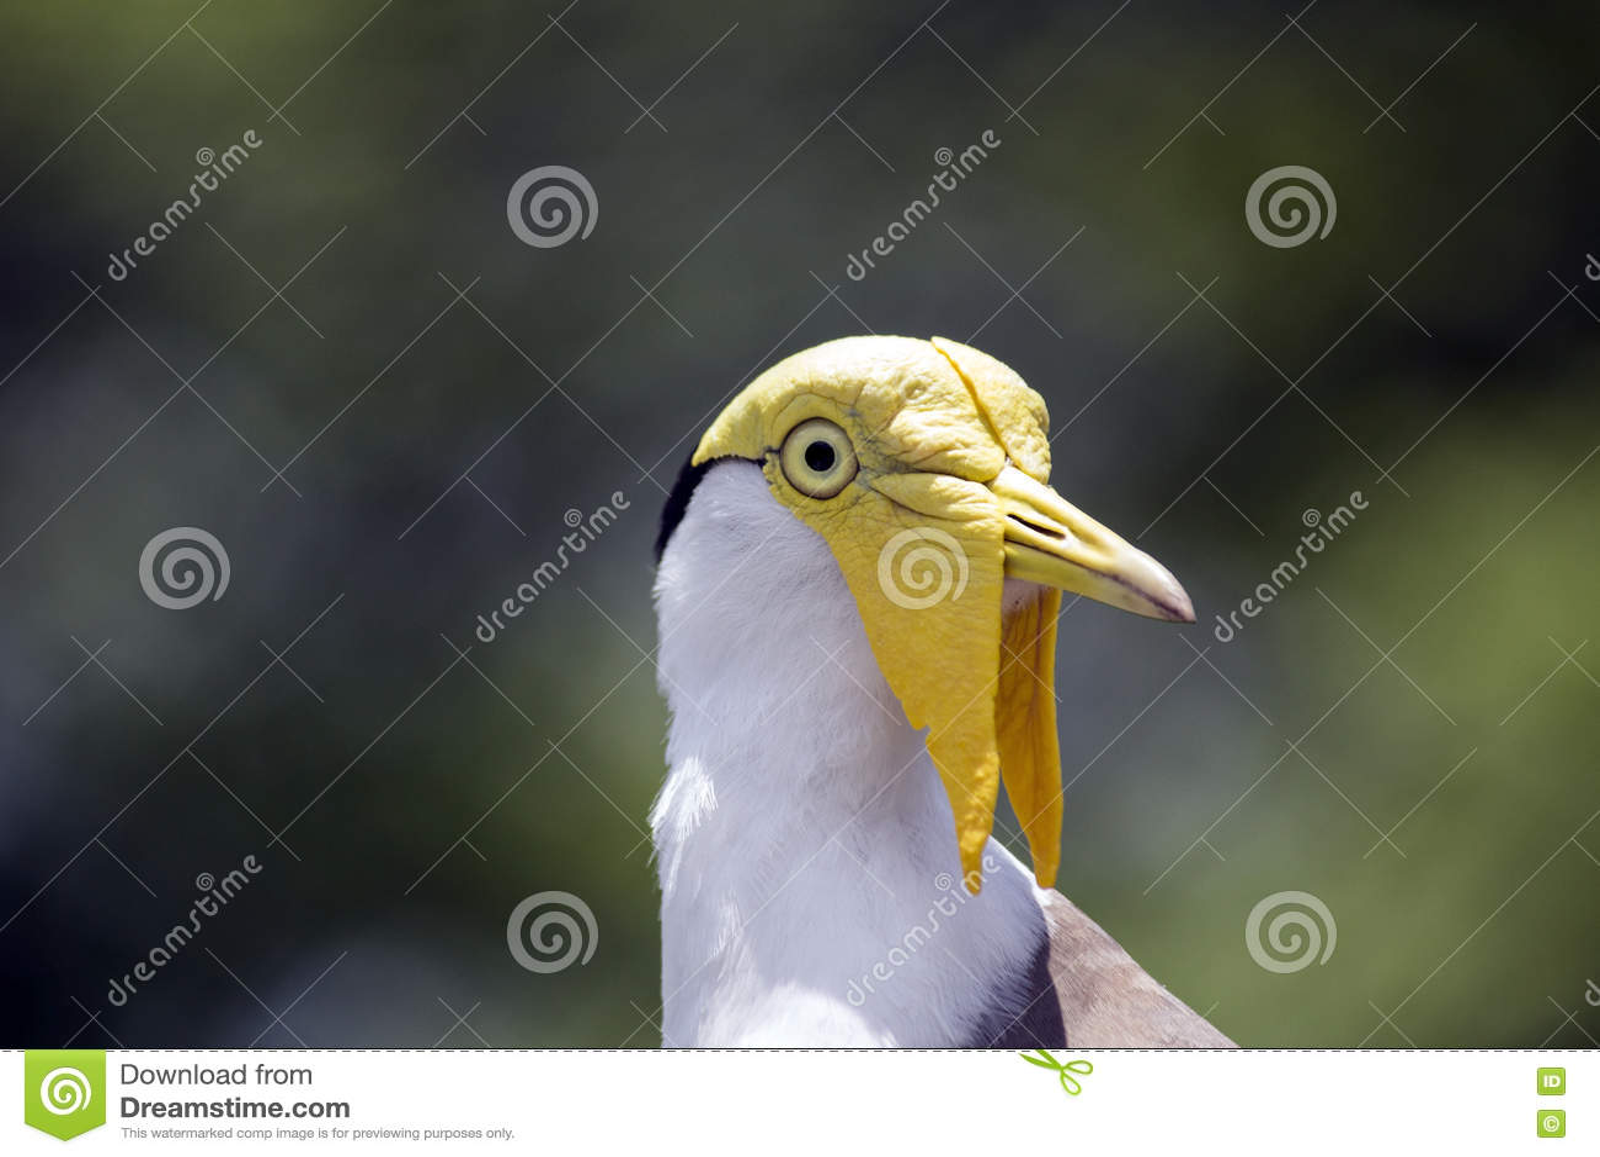 yellow head masked lapwing bird right stock image image of aviary